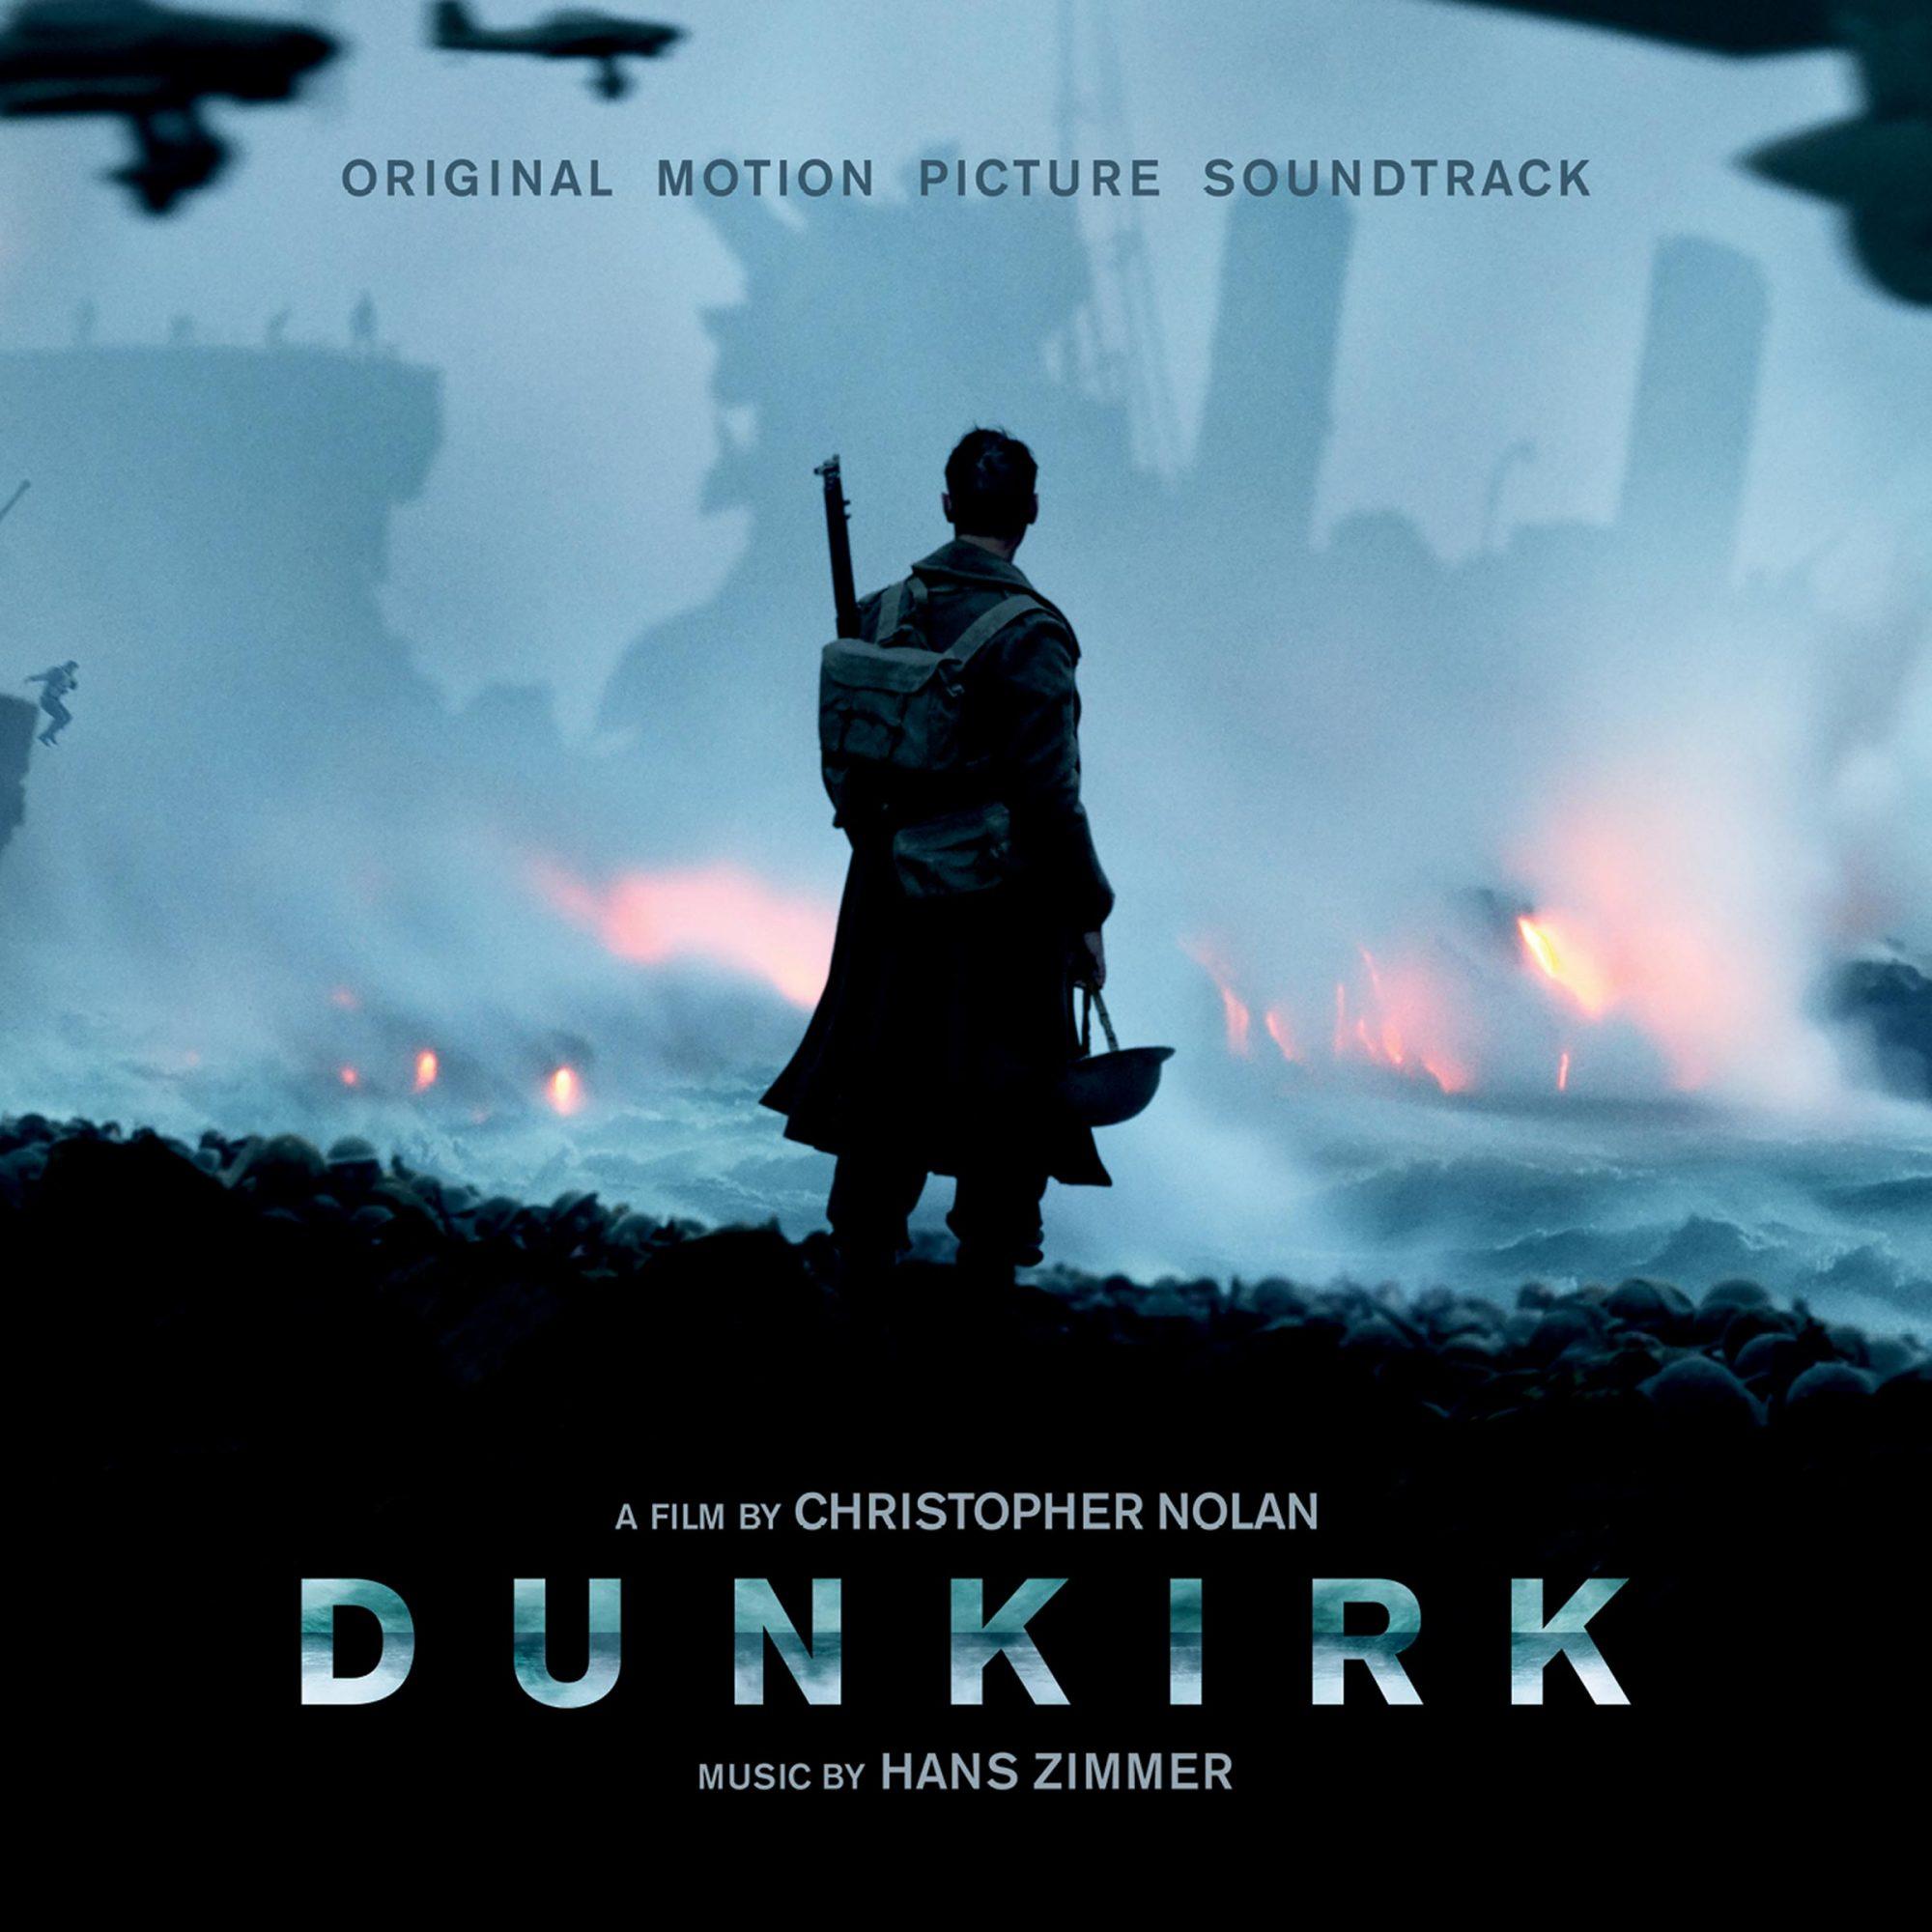 Dunkirk_Sdtk_Cover_01_1425px_RGB_300dpi